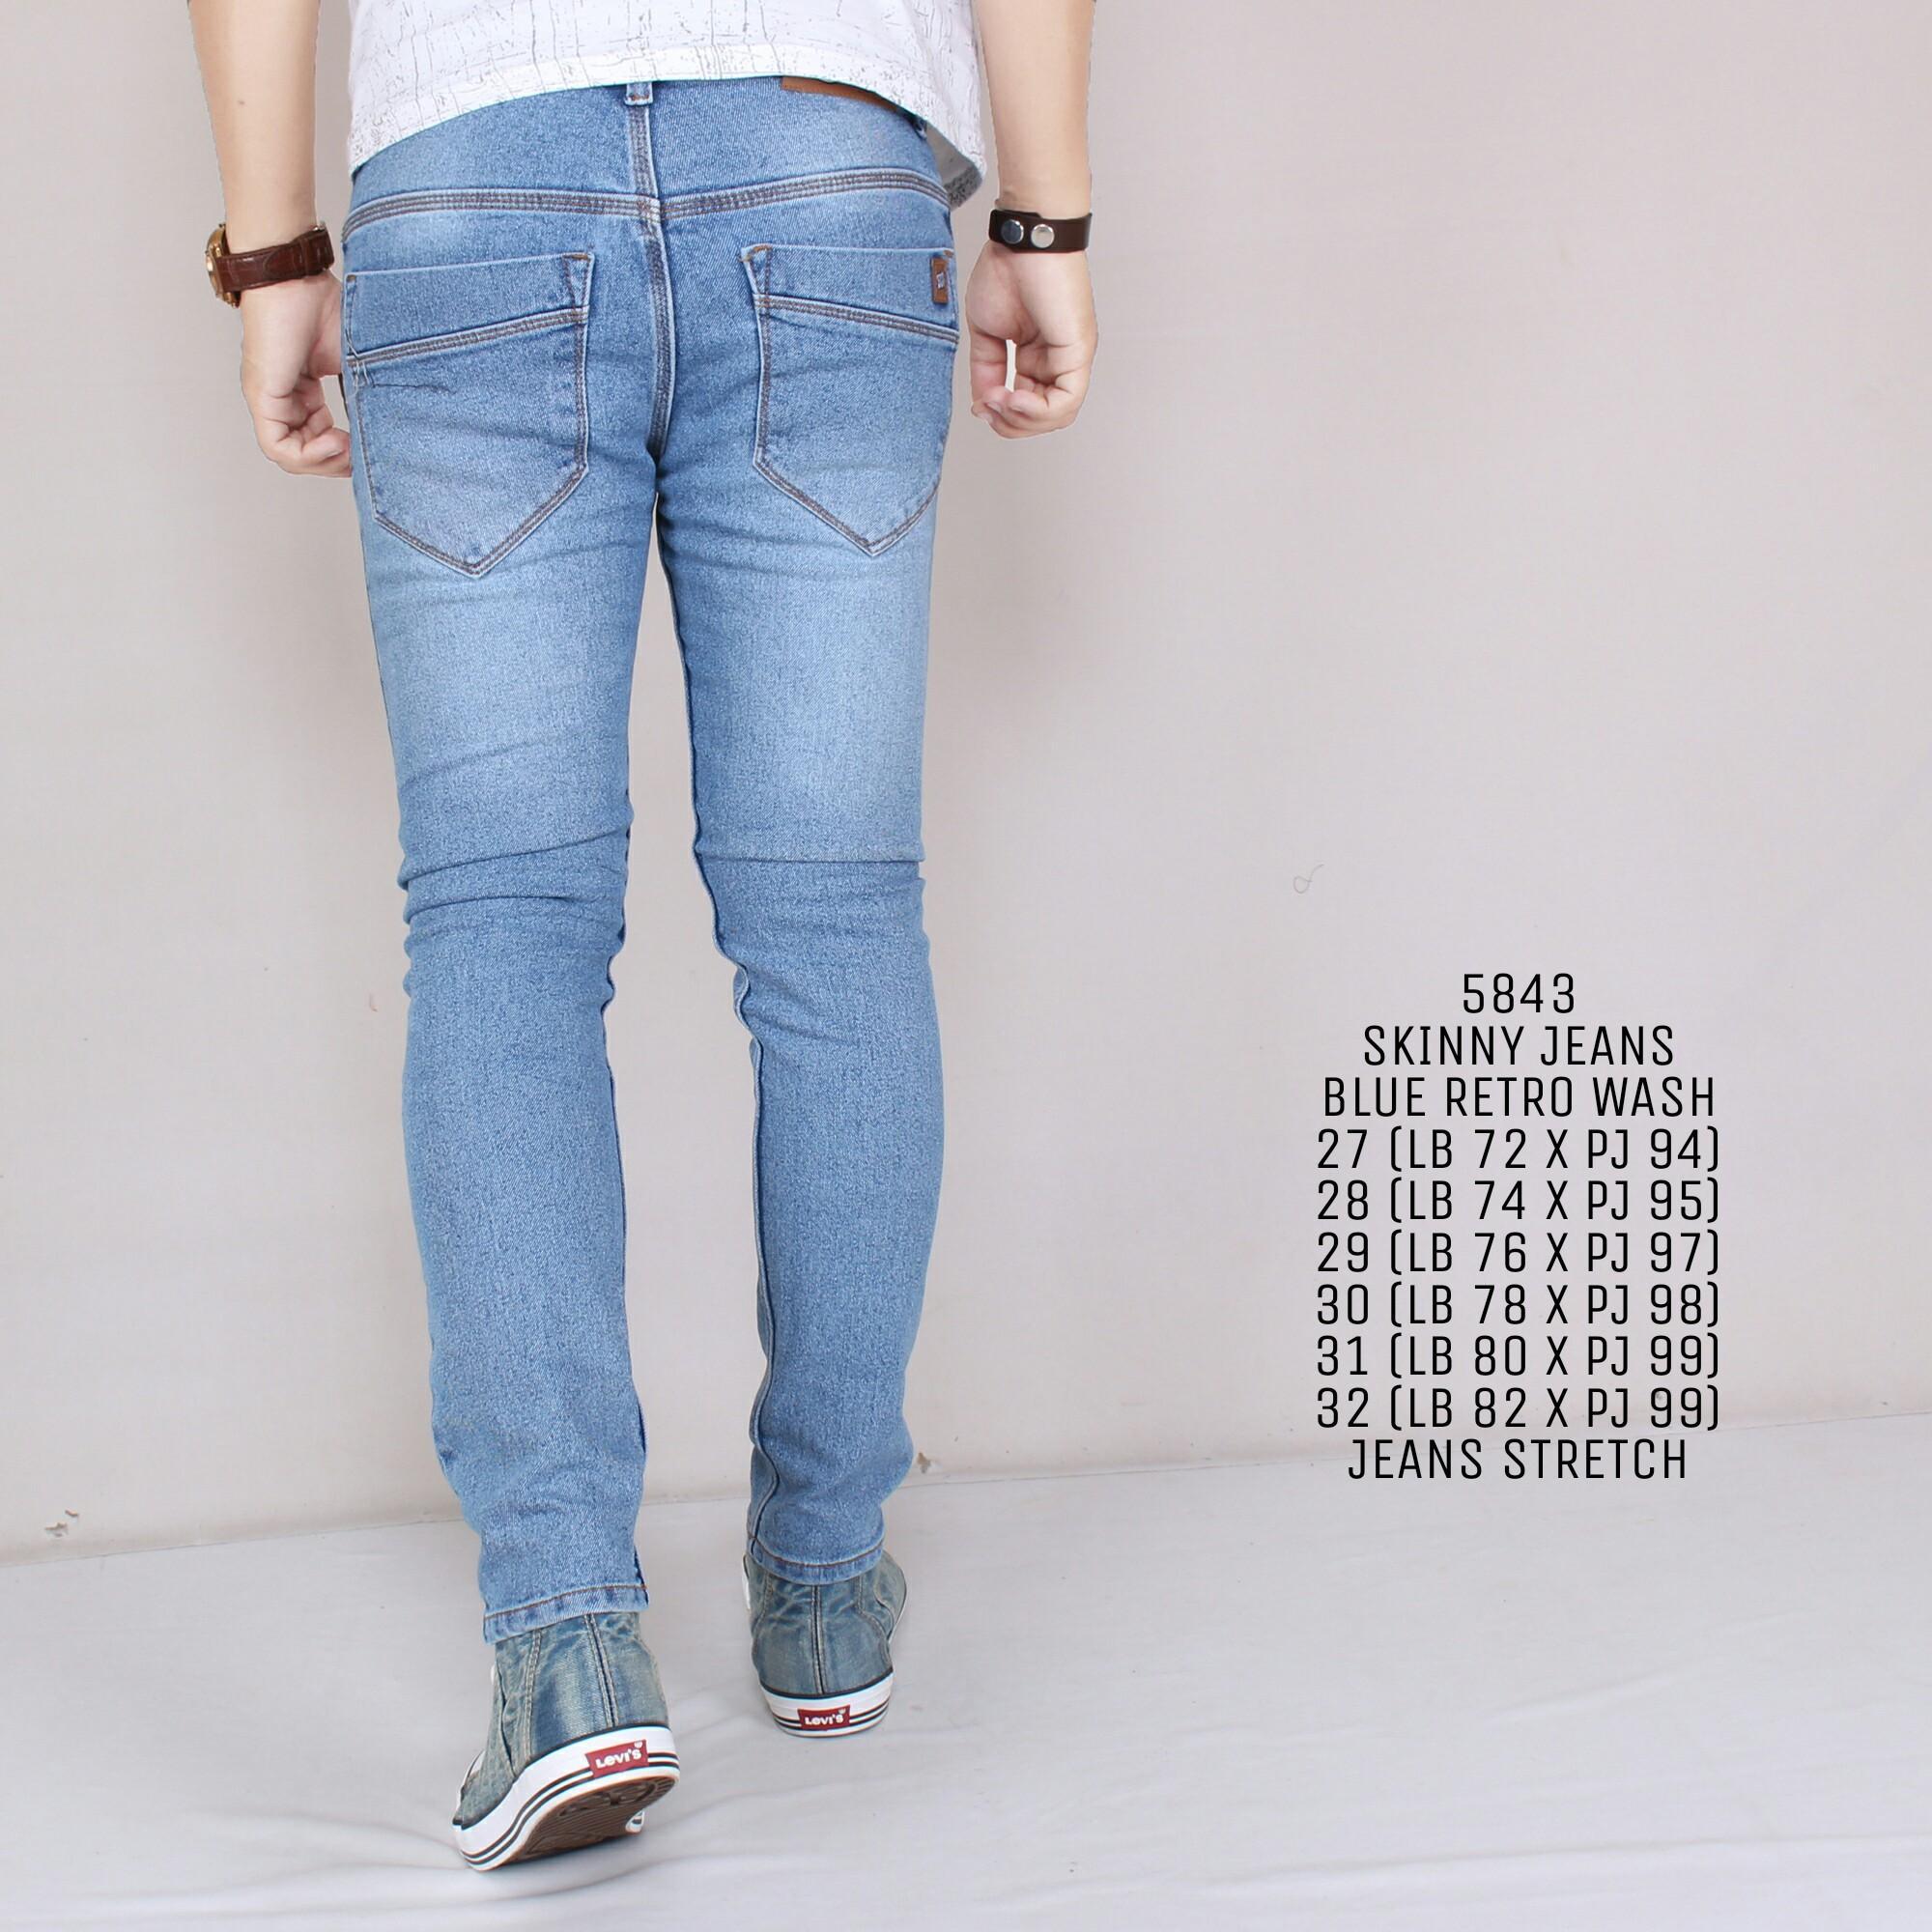 An Celana Jeans Panjang Pria Skinny Hight Quality Blue Daftar Lois Original Sskt081 Navy 33 Zoeystore 5843 Celena Cowok Washing Cut Rips